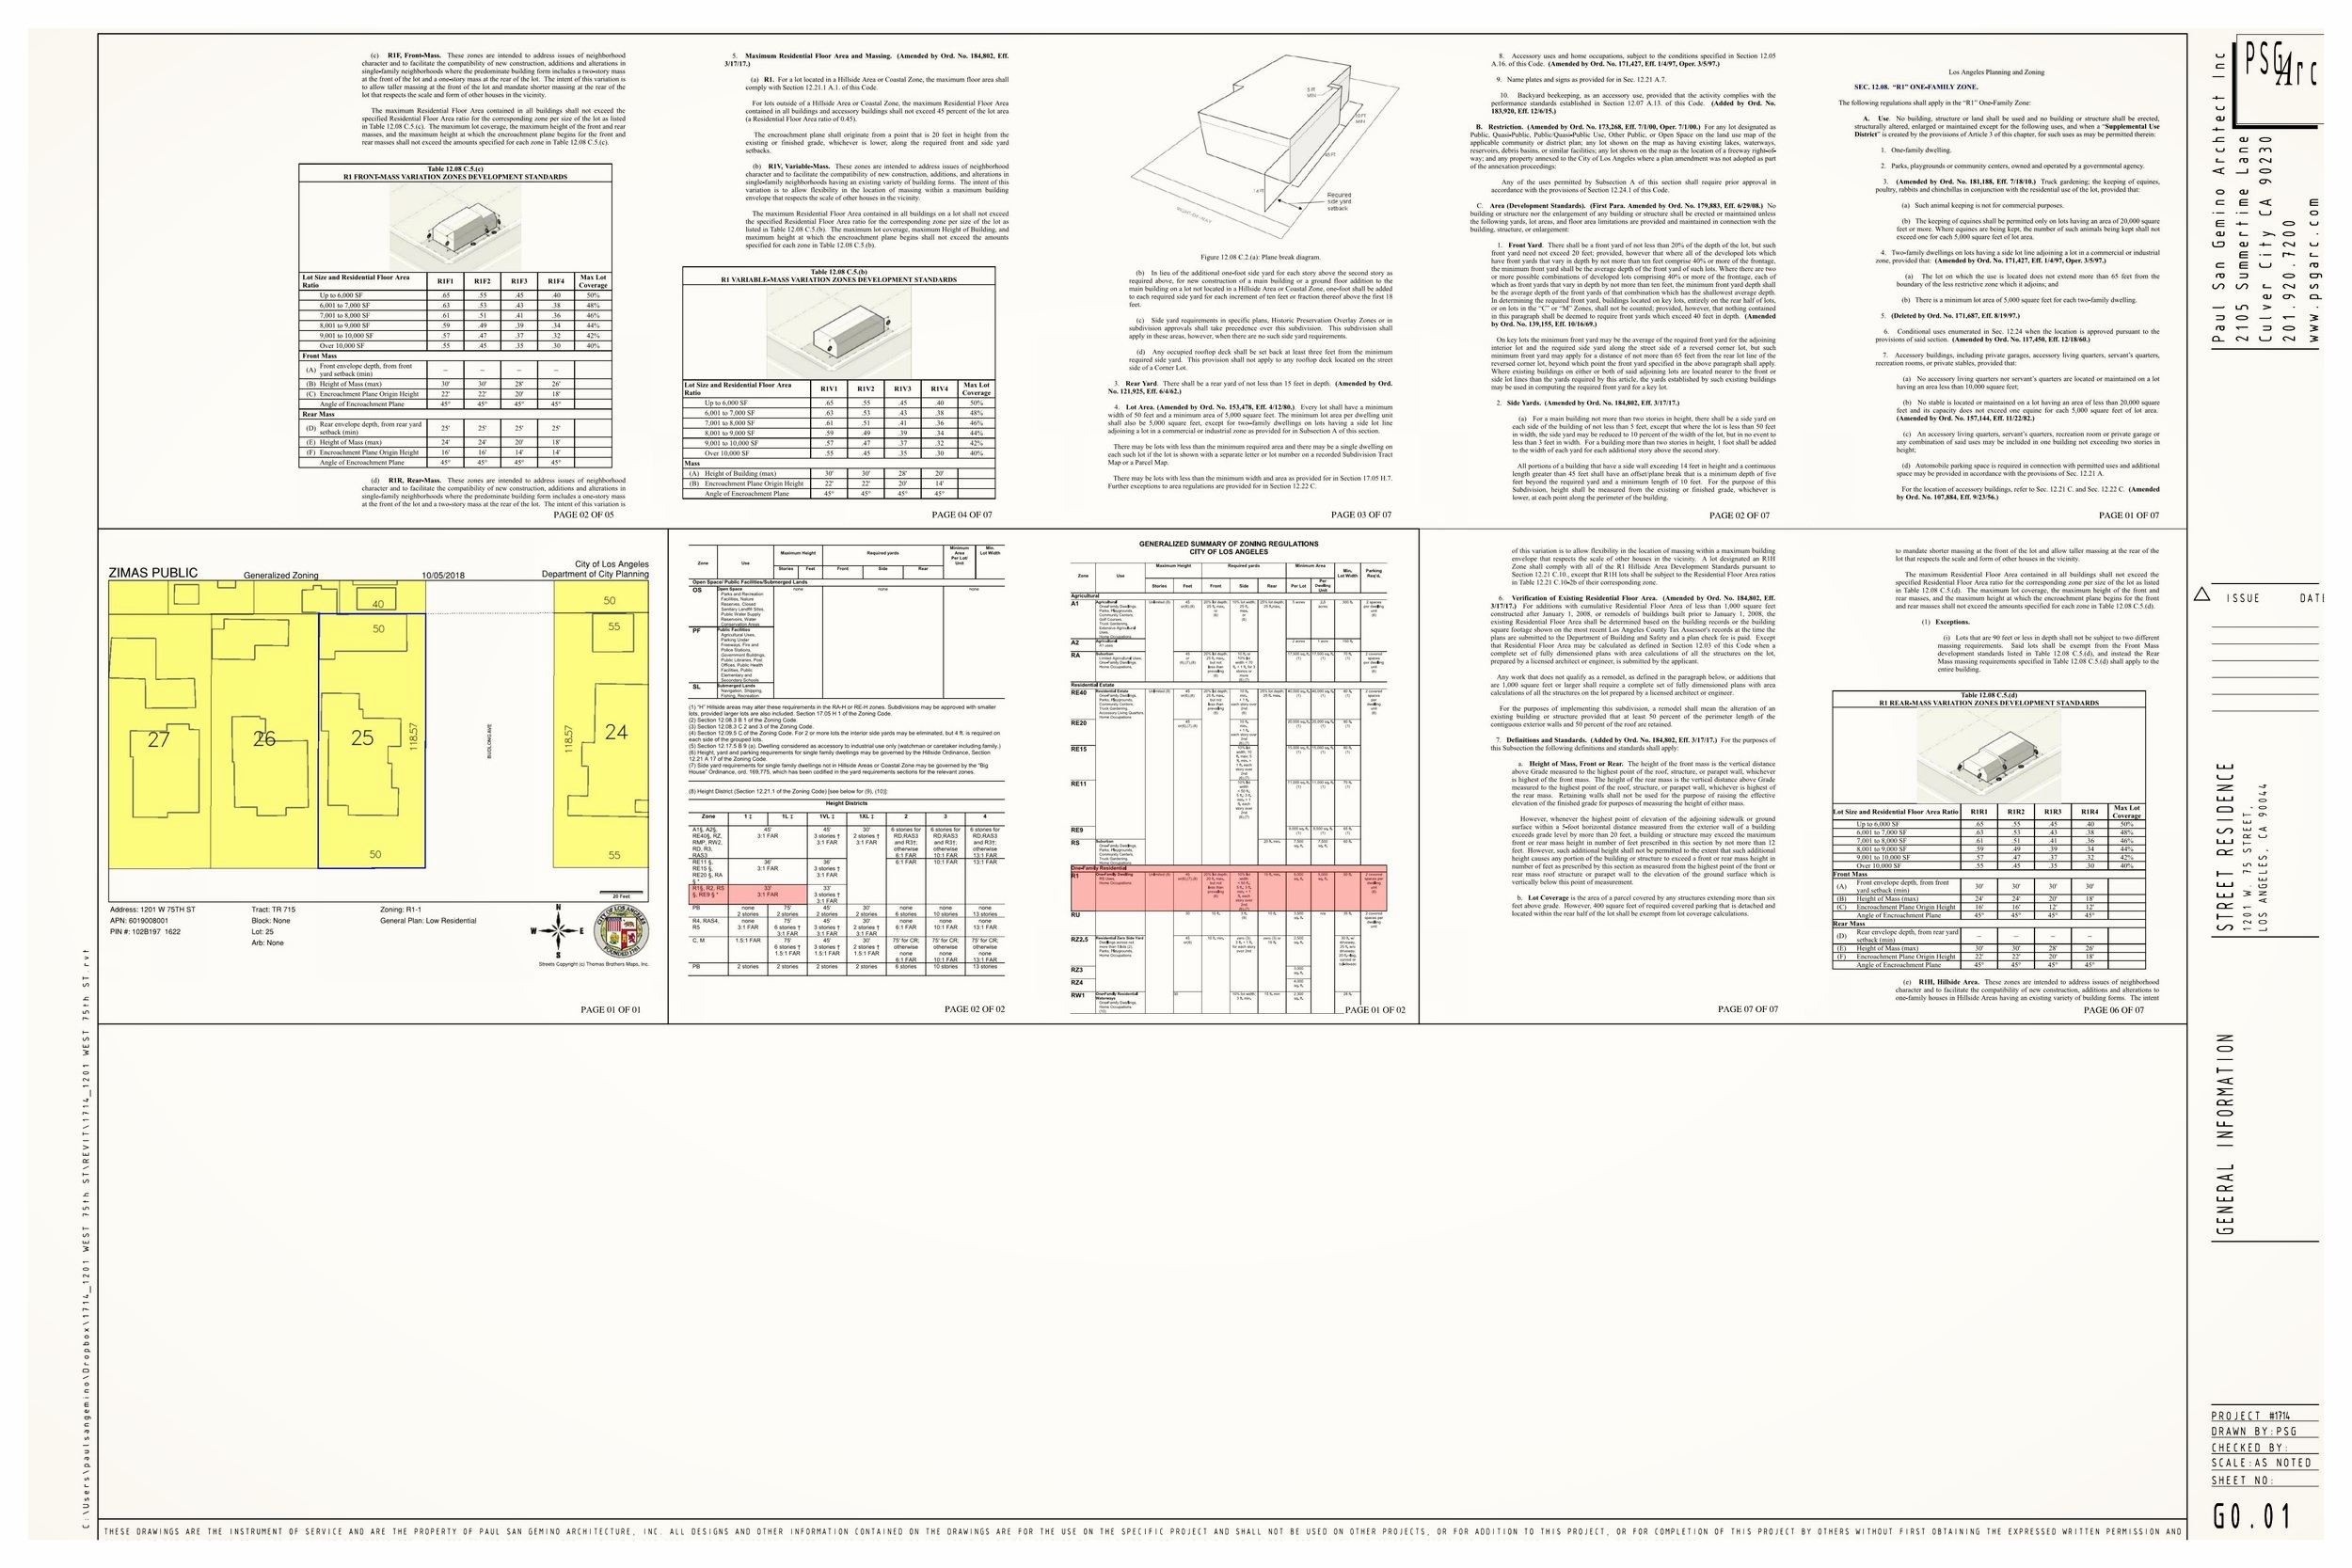 PSGArc_Feasibility 01.jpg